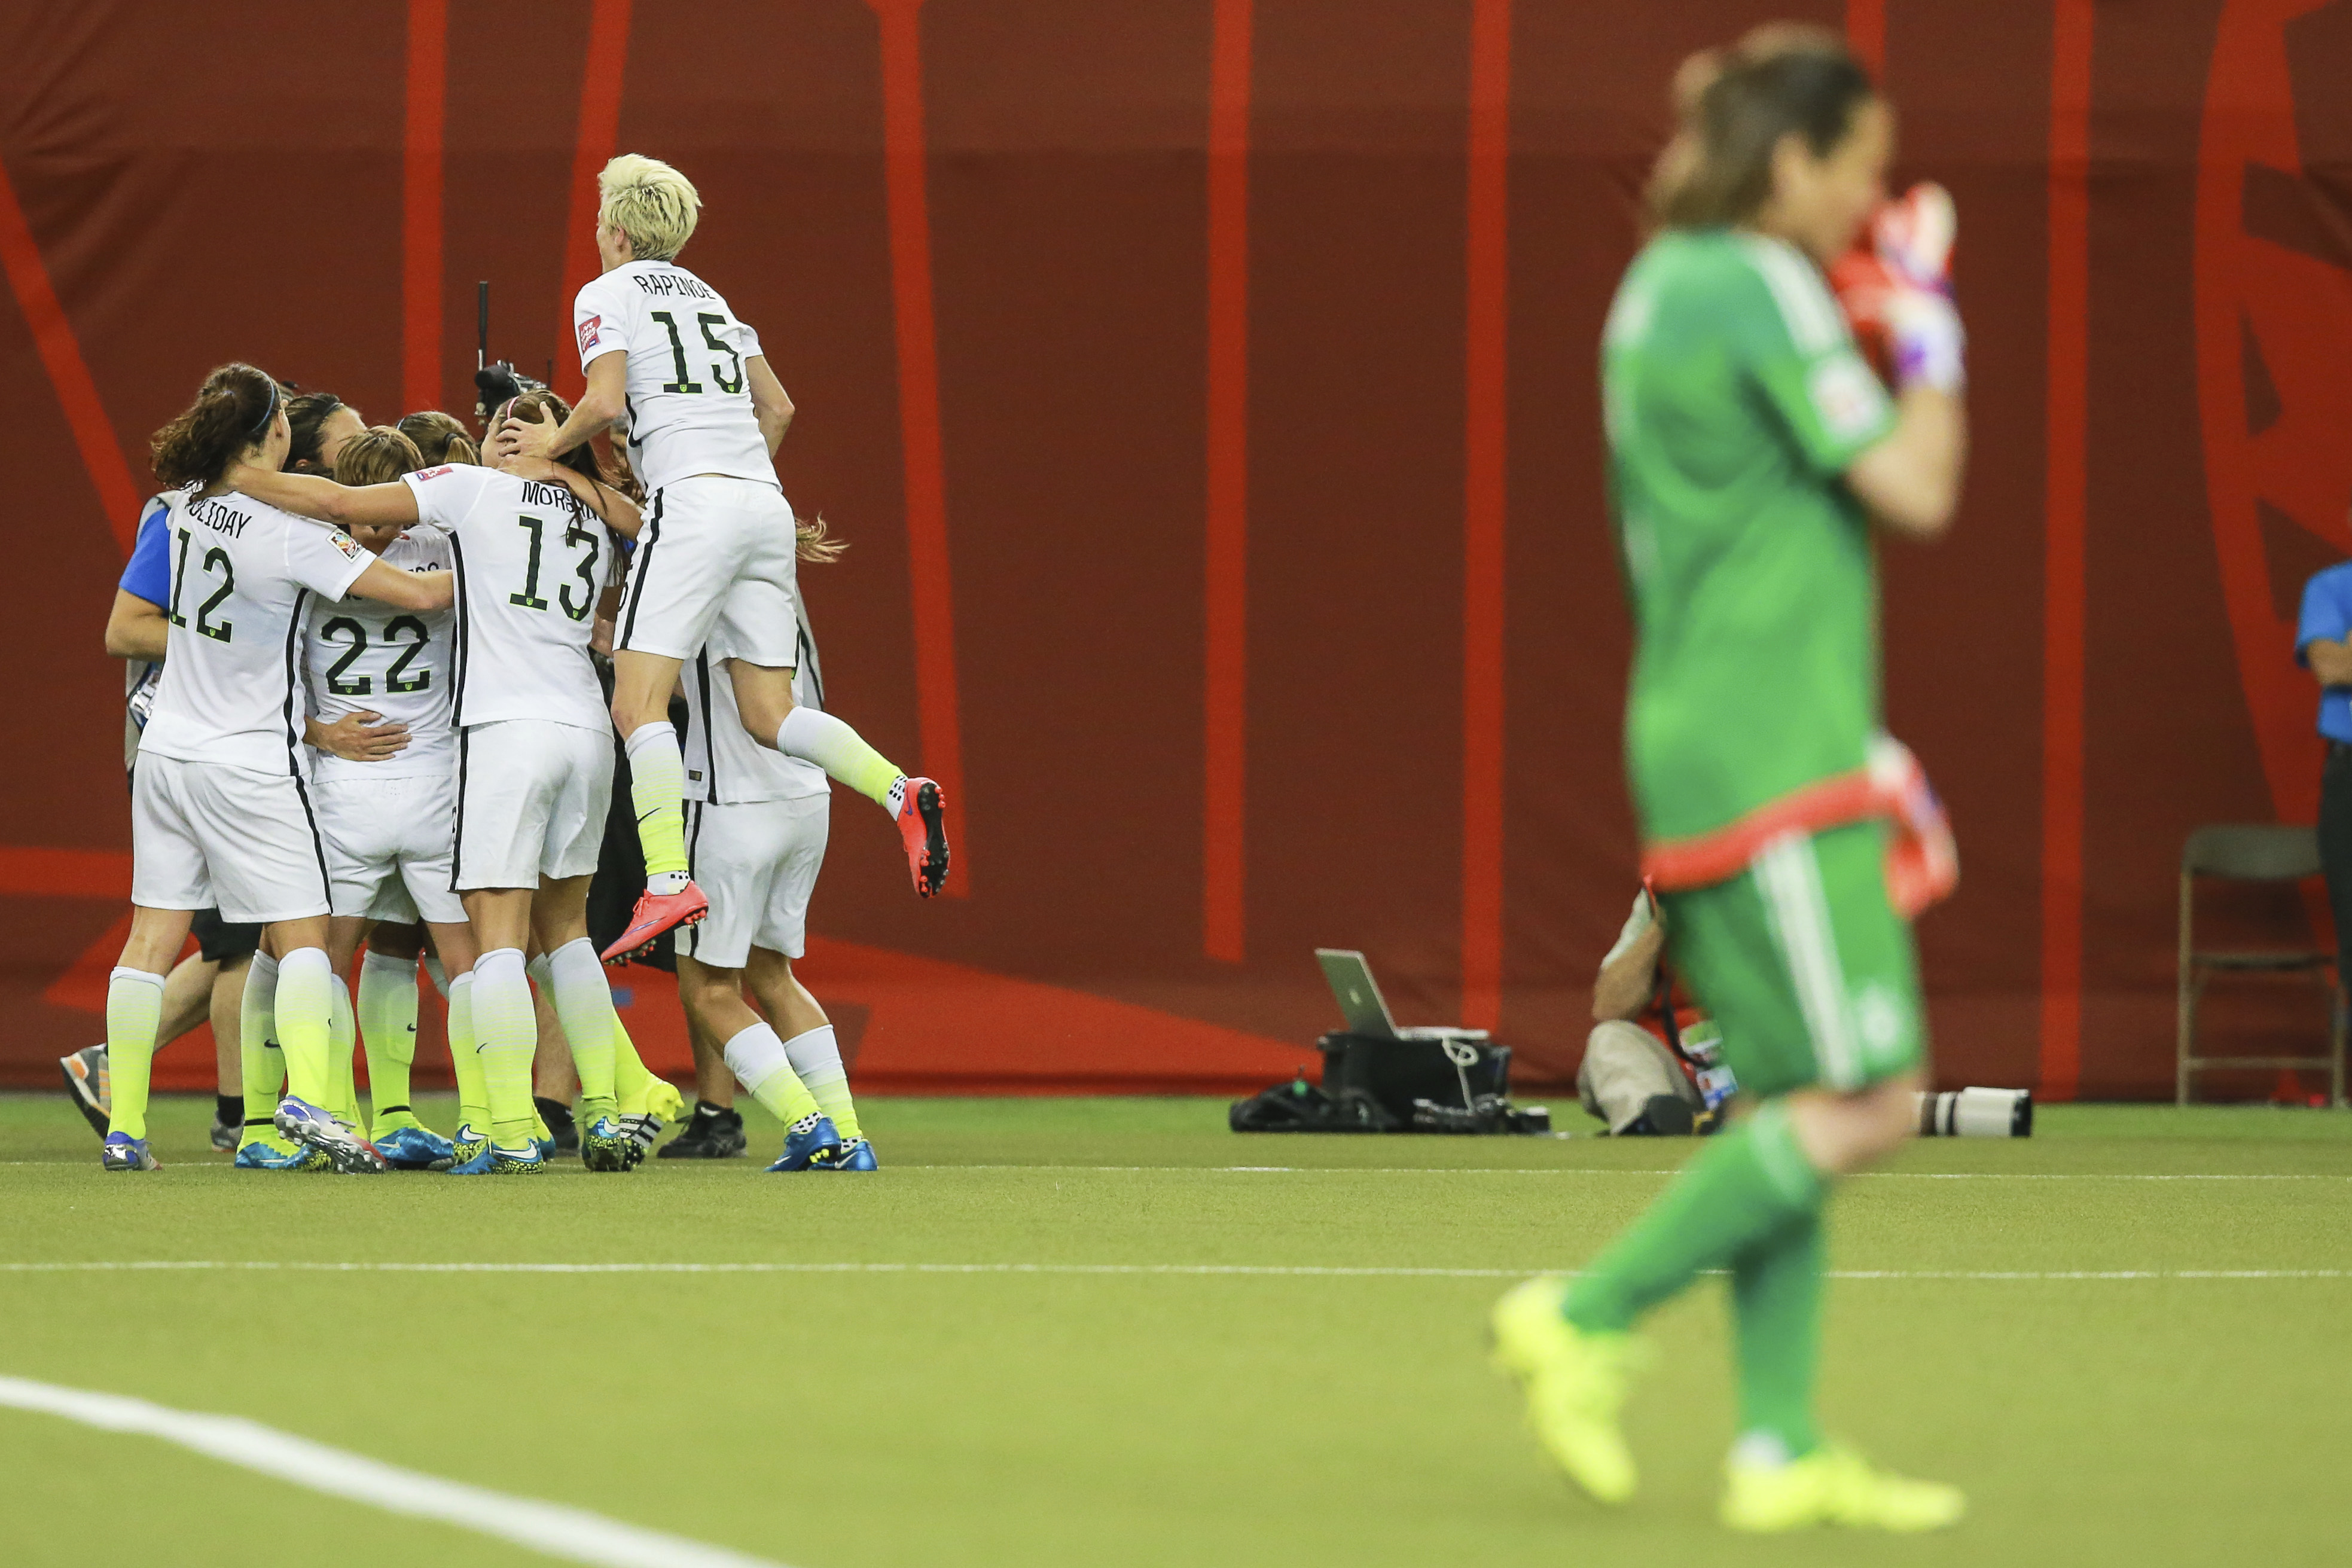 USA v Germany - FIFA Women's World Cup 2015